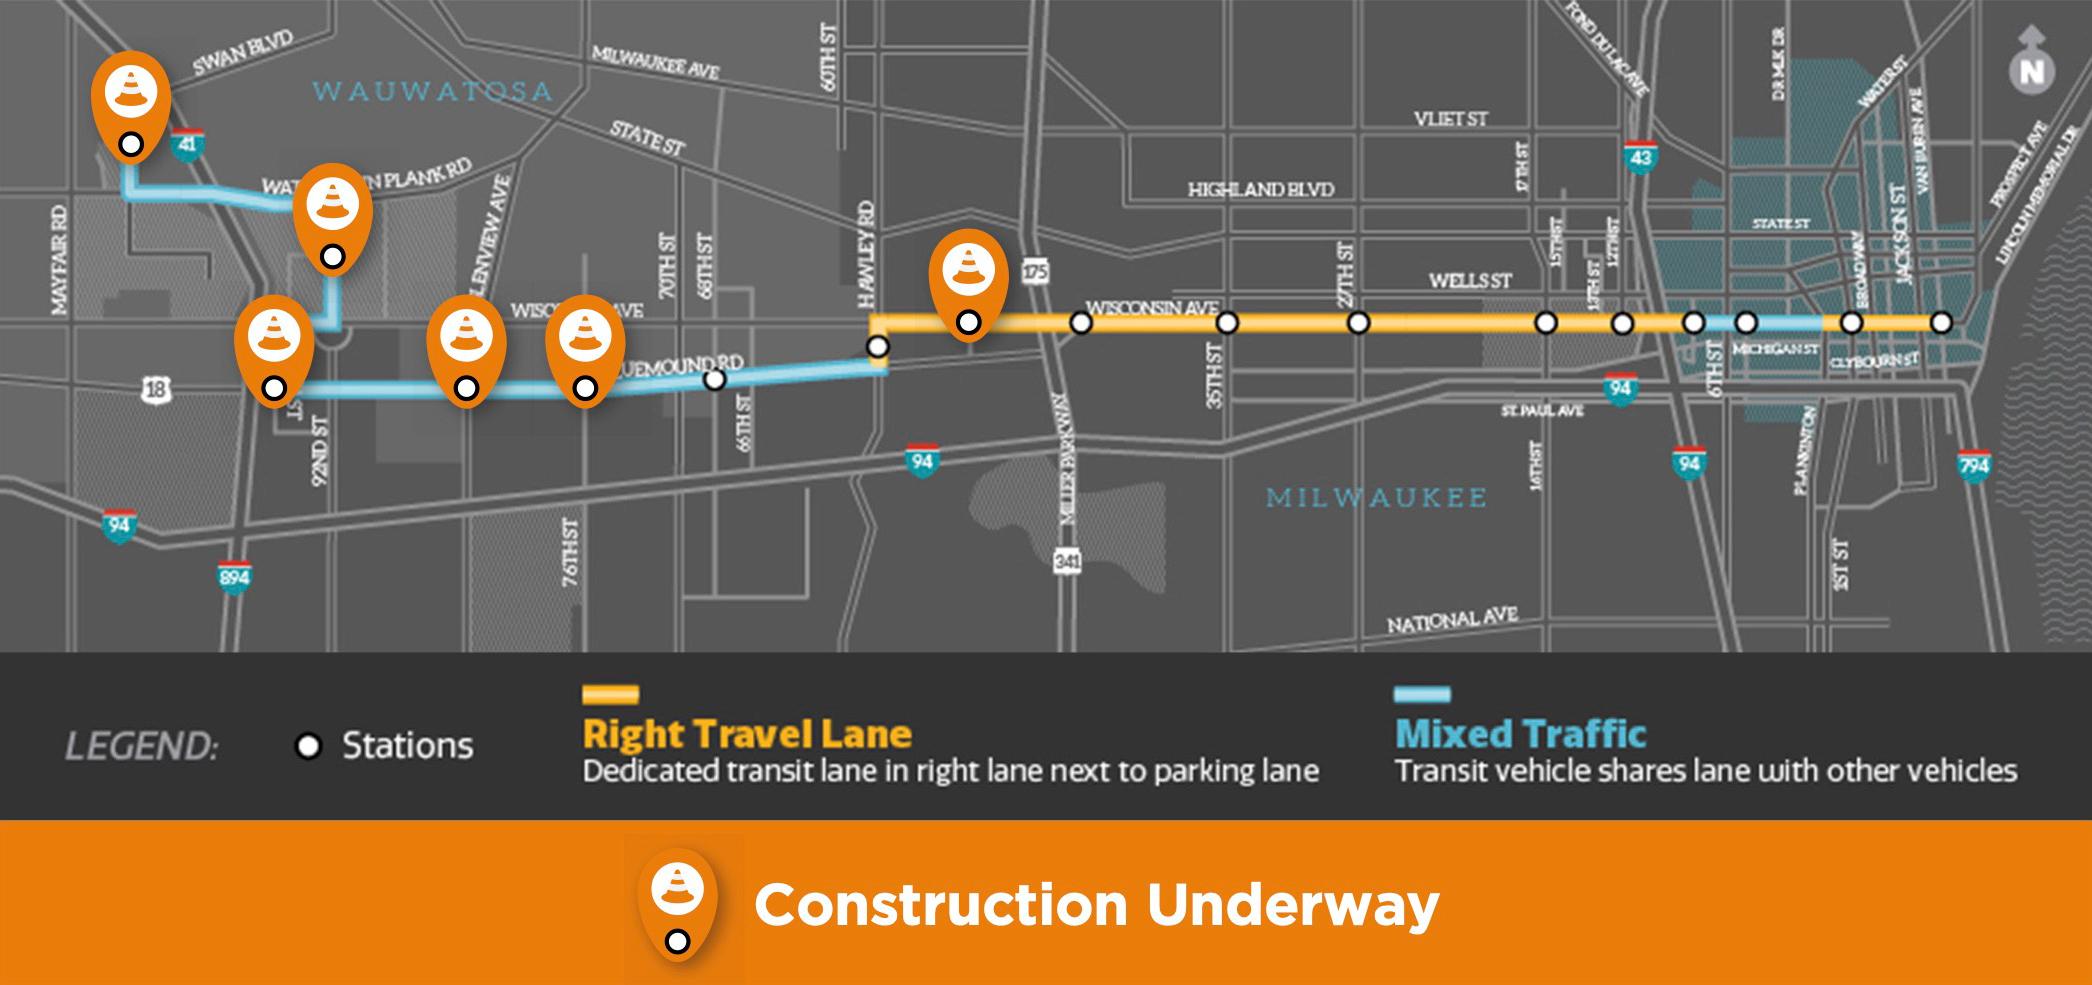 Construction Map-7-9-21